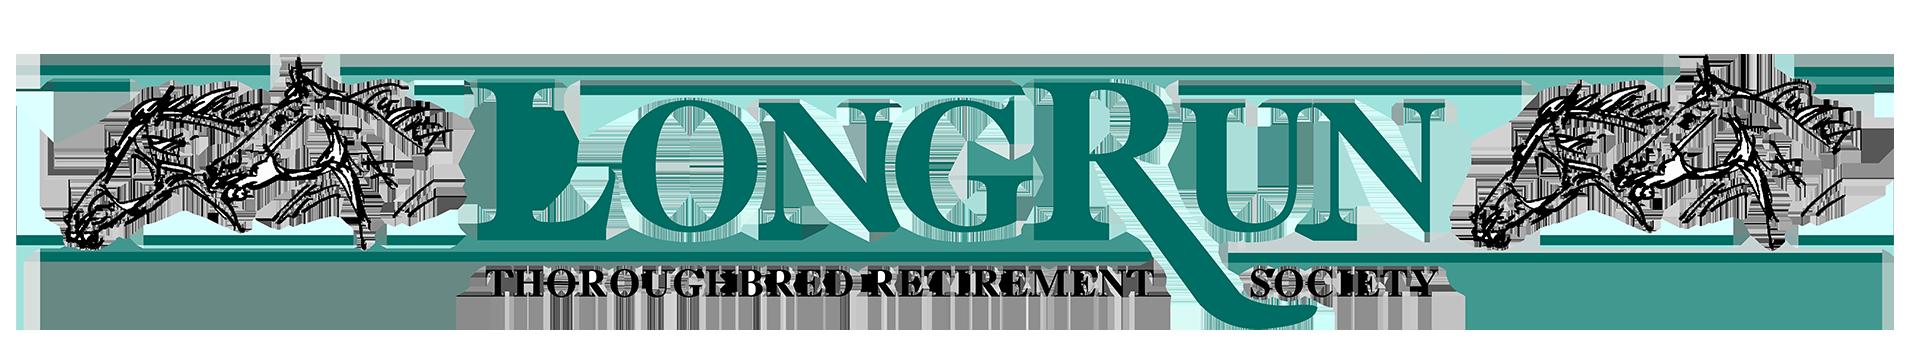 LongRun Thoroughbred Retirement Society